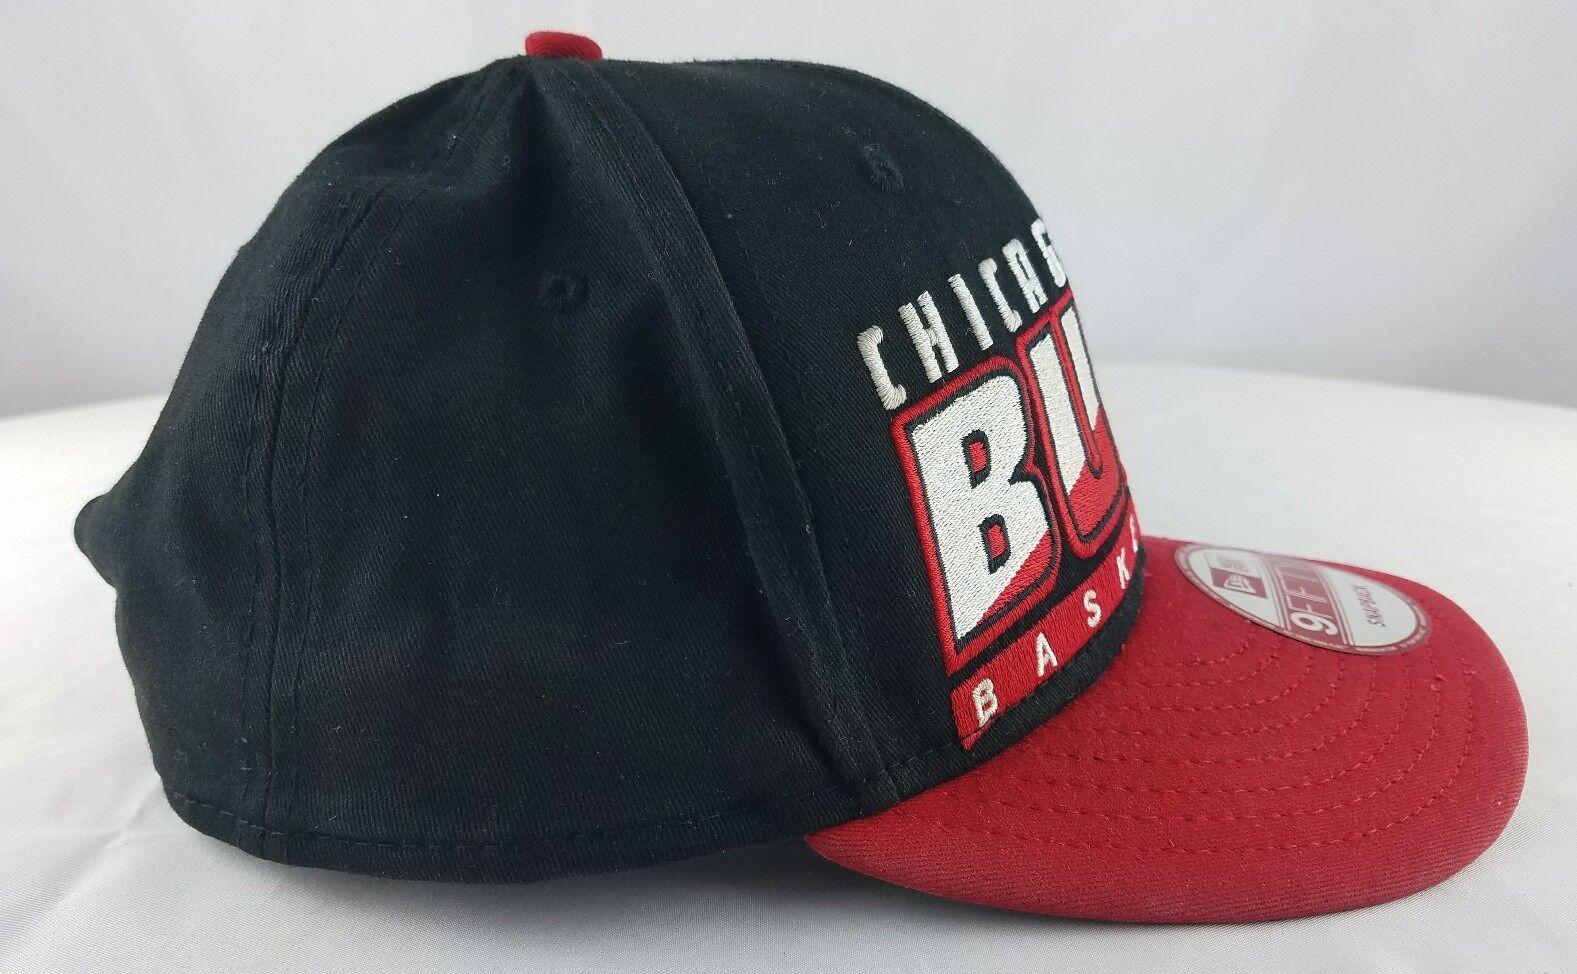 Miami Heat Slice and Dice Black Red White Orange New Era 9Fifty Snapback Hat